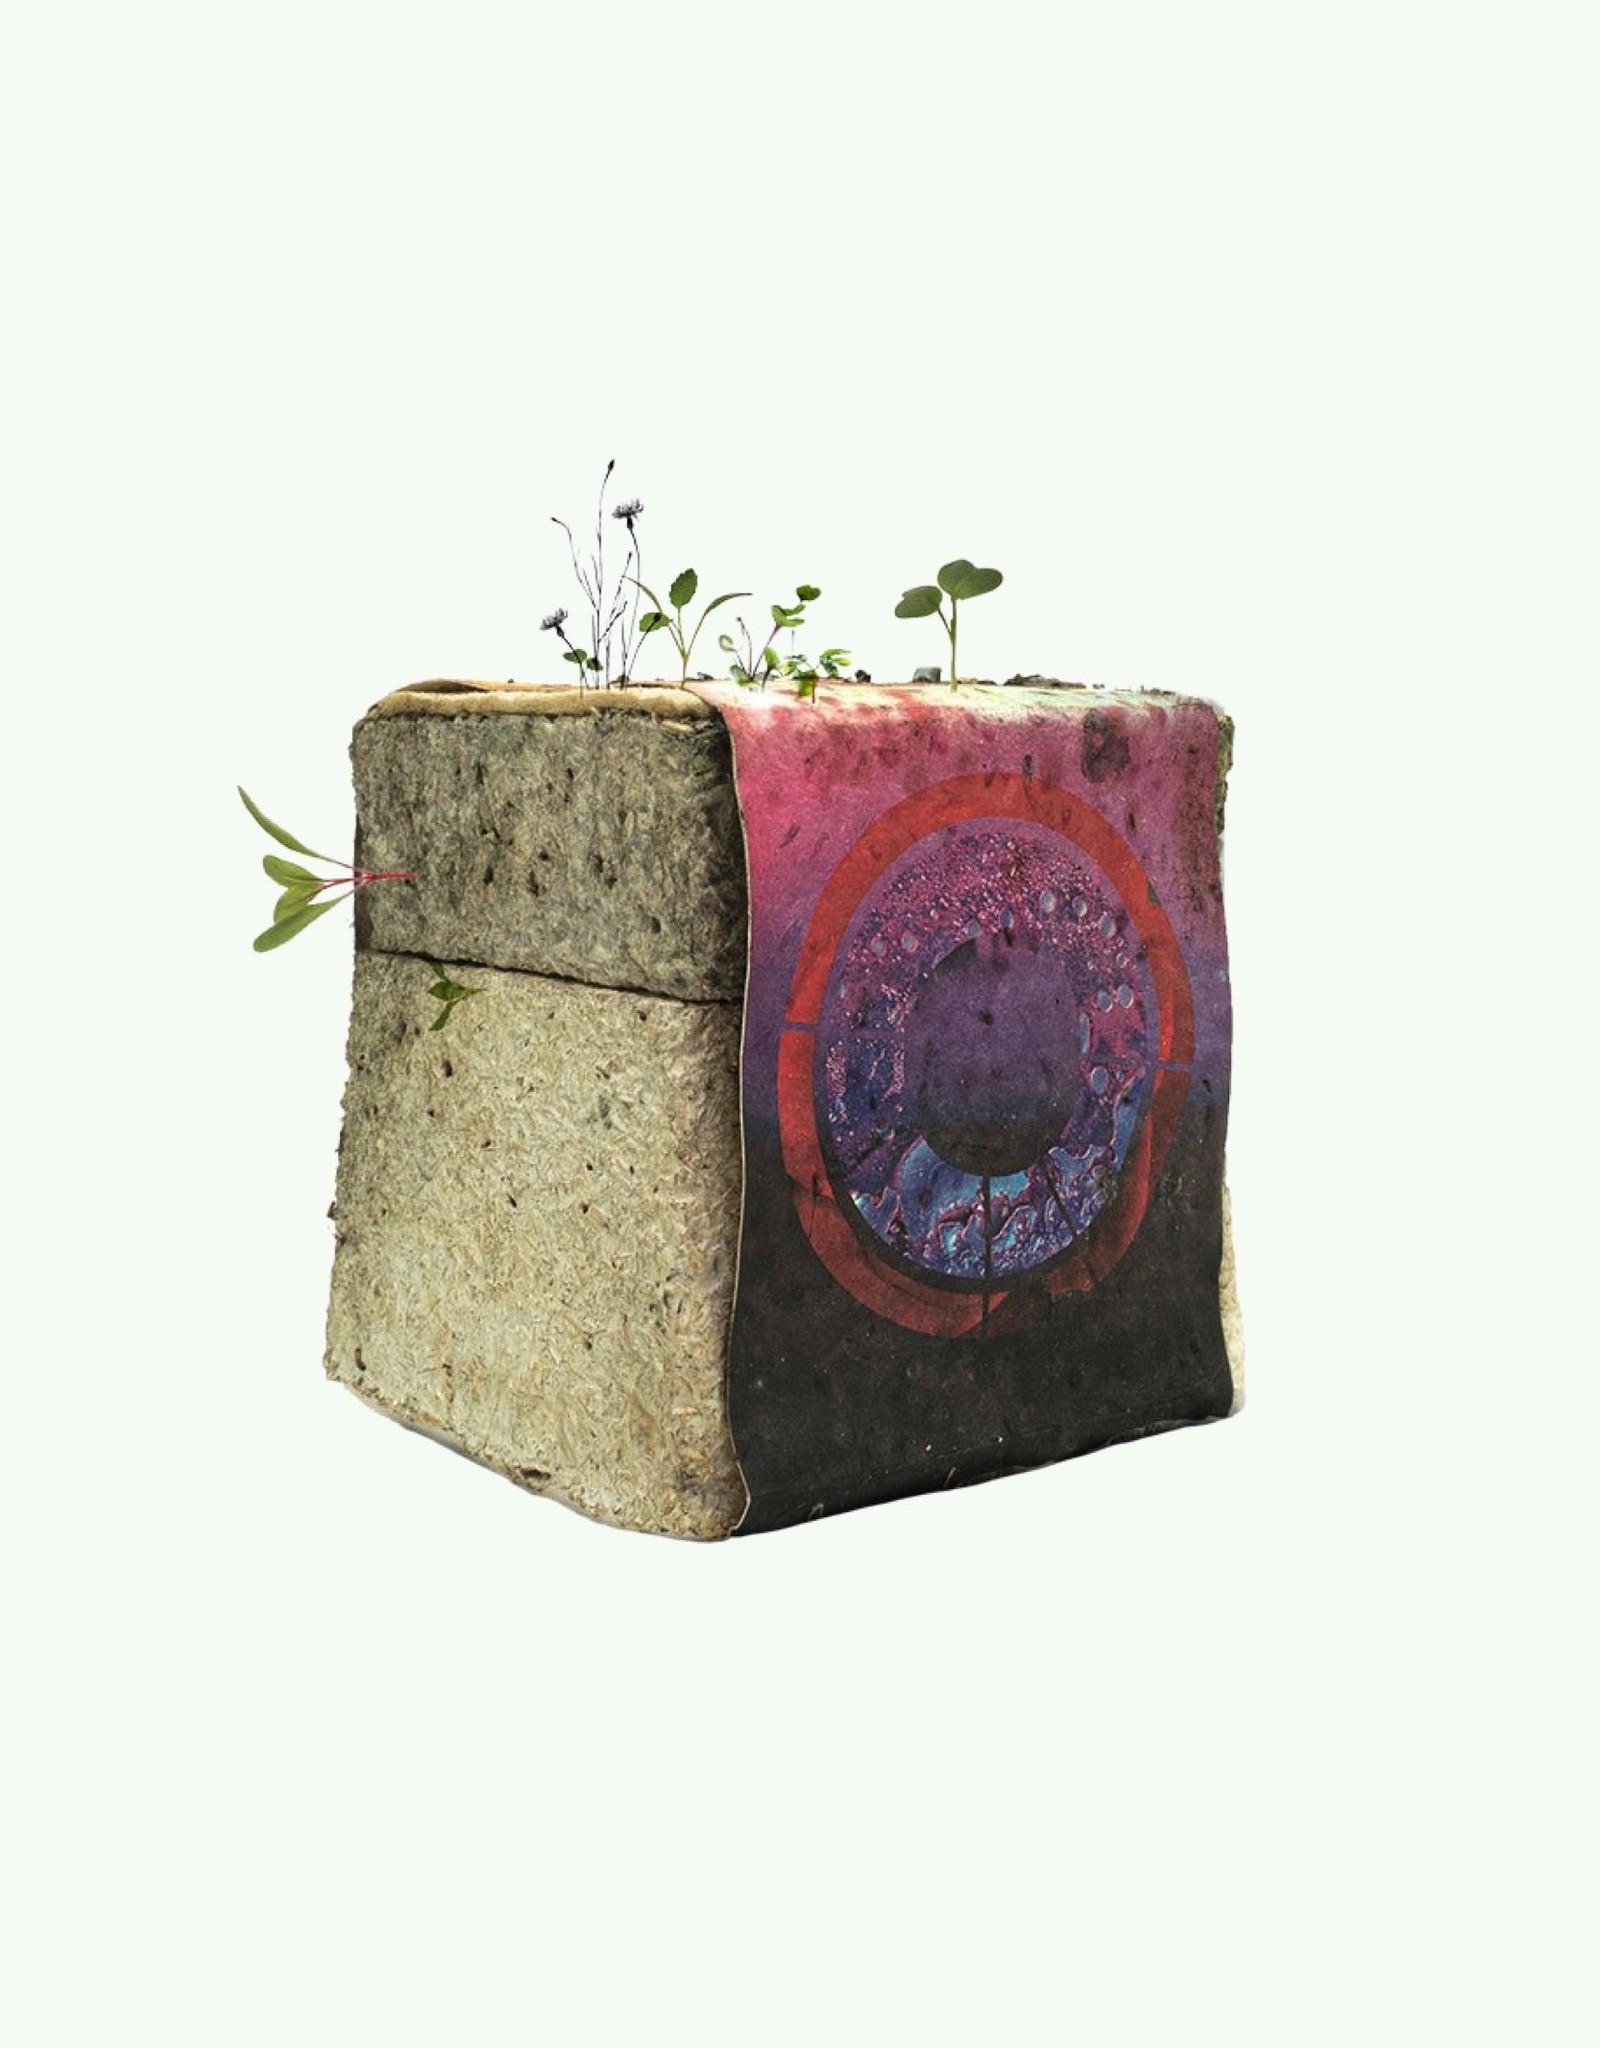 "Haeckels Haeckels - Reculver GPS 12' 0""E - Candle Mycelium"